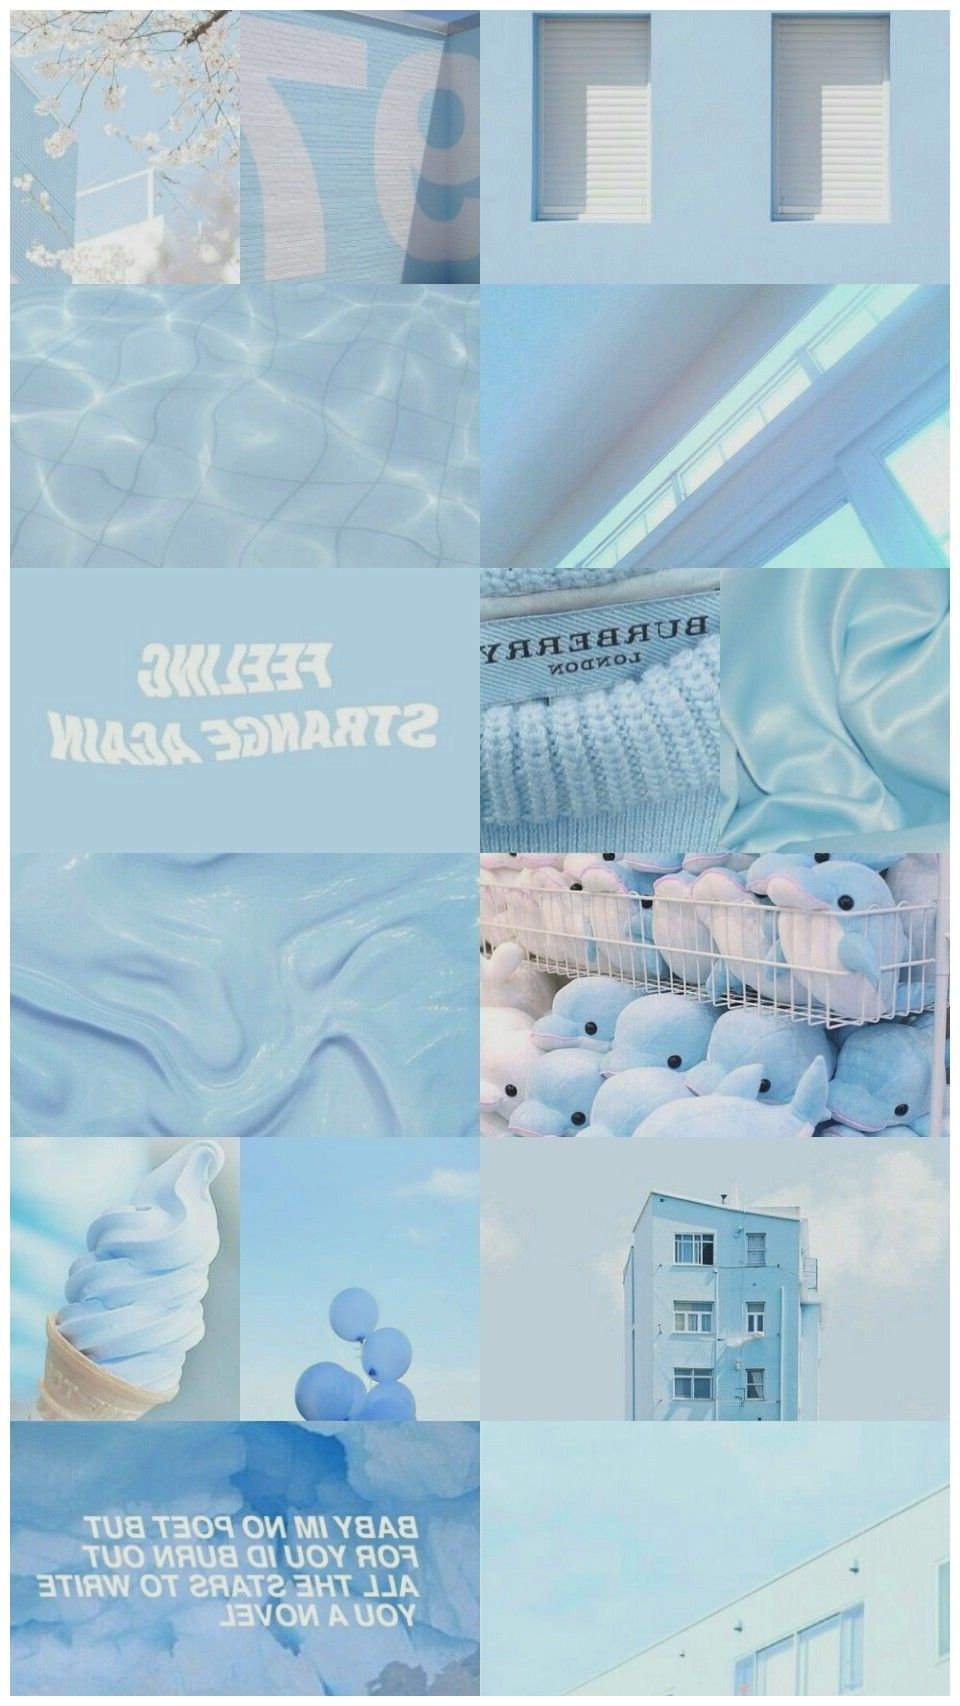 Pastel Aesthetic Wallpaper In 2020 Blue Aesthetic Pastel Aesthetic Desktop Wallpaper Blue Aesthetic